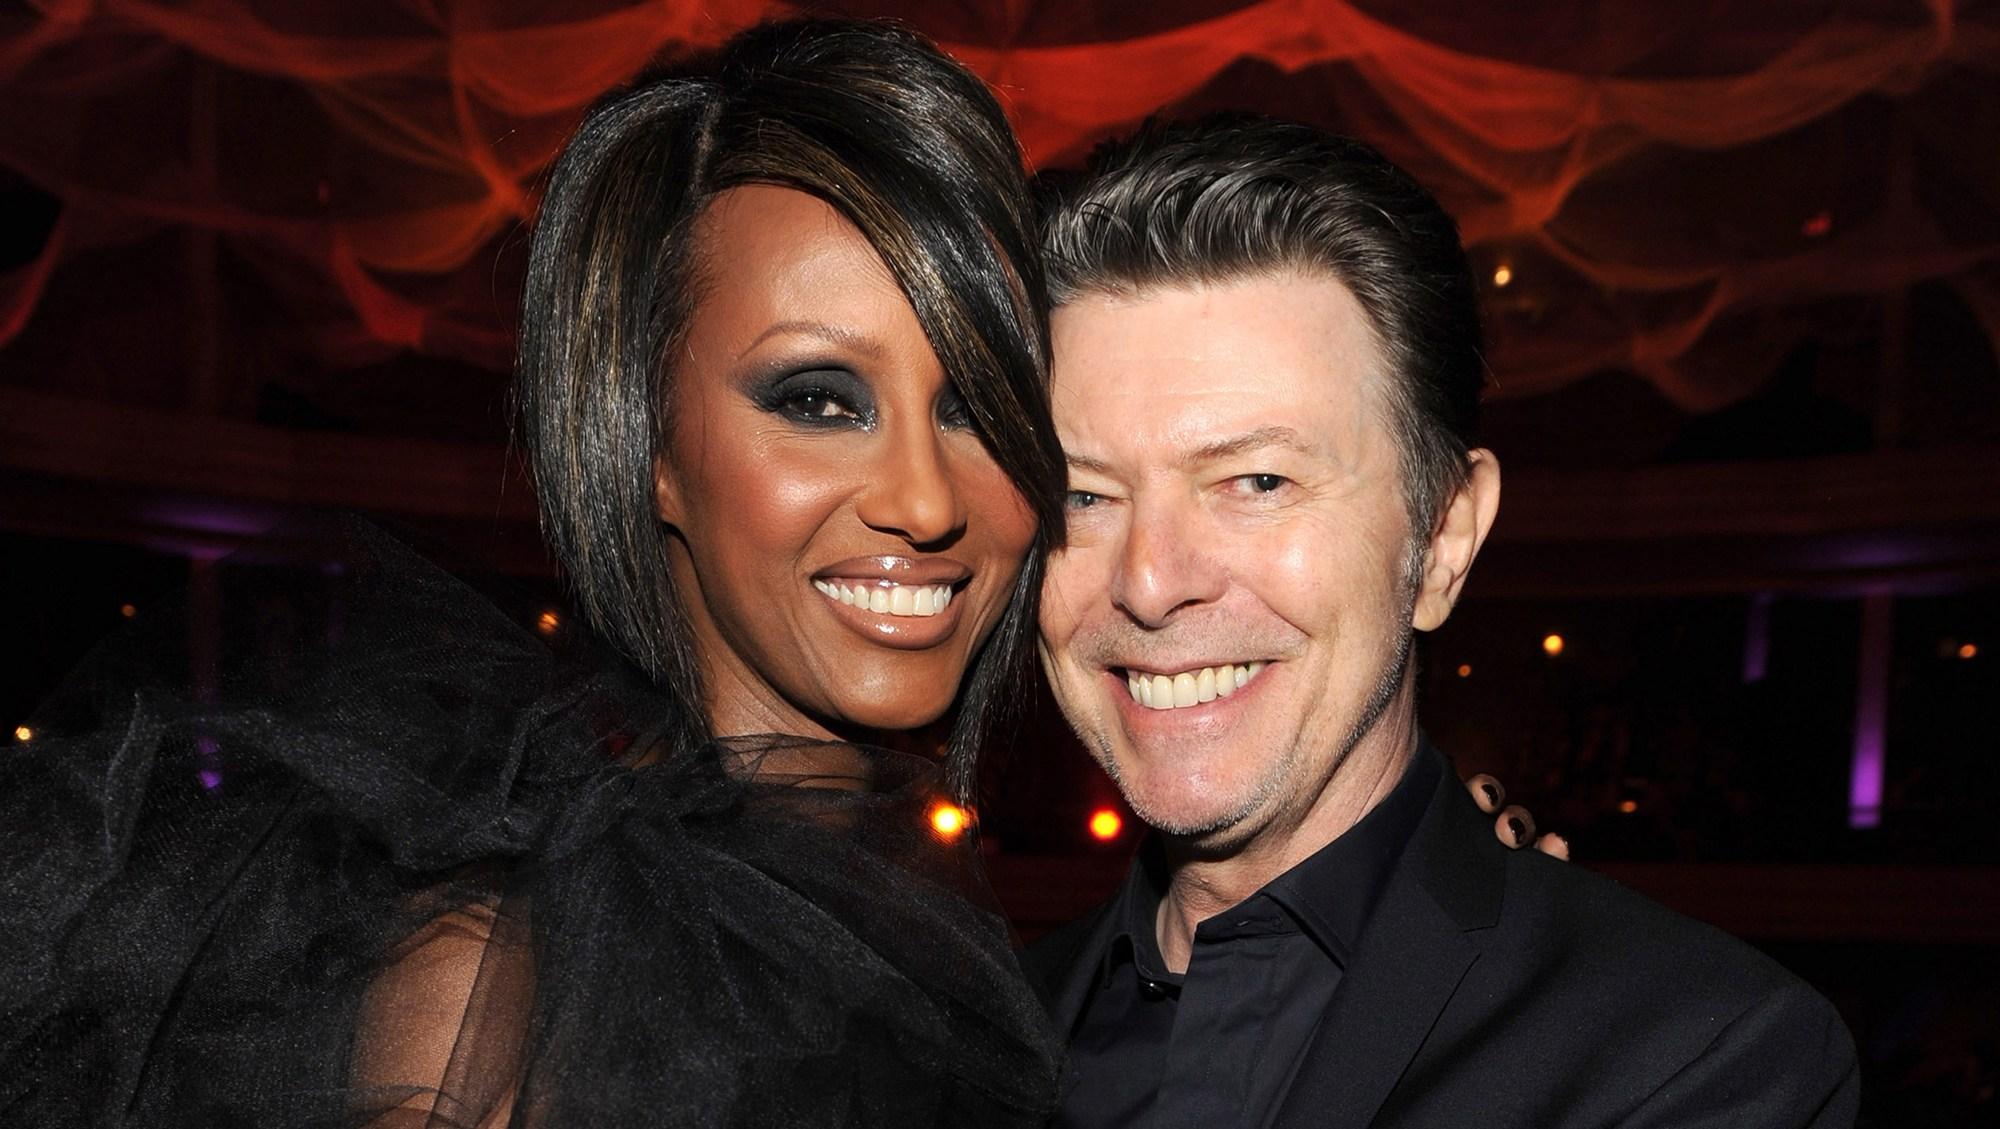 Iman and David Bowie birthday